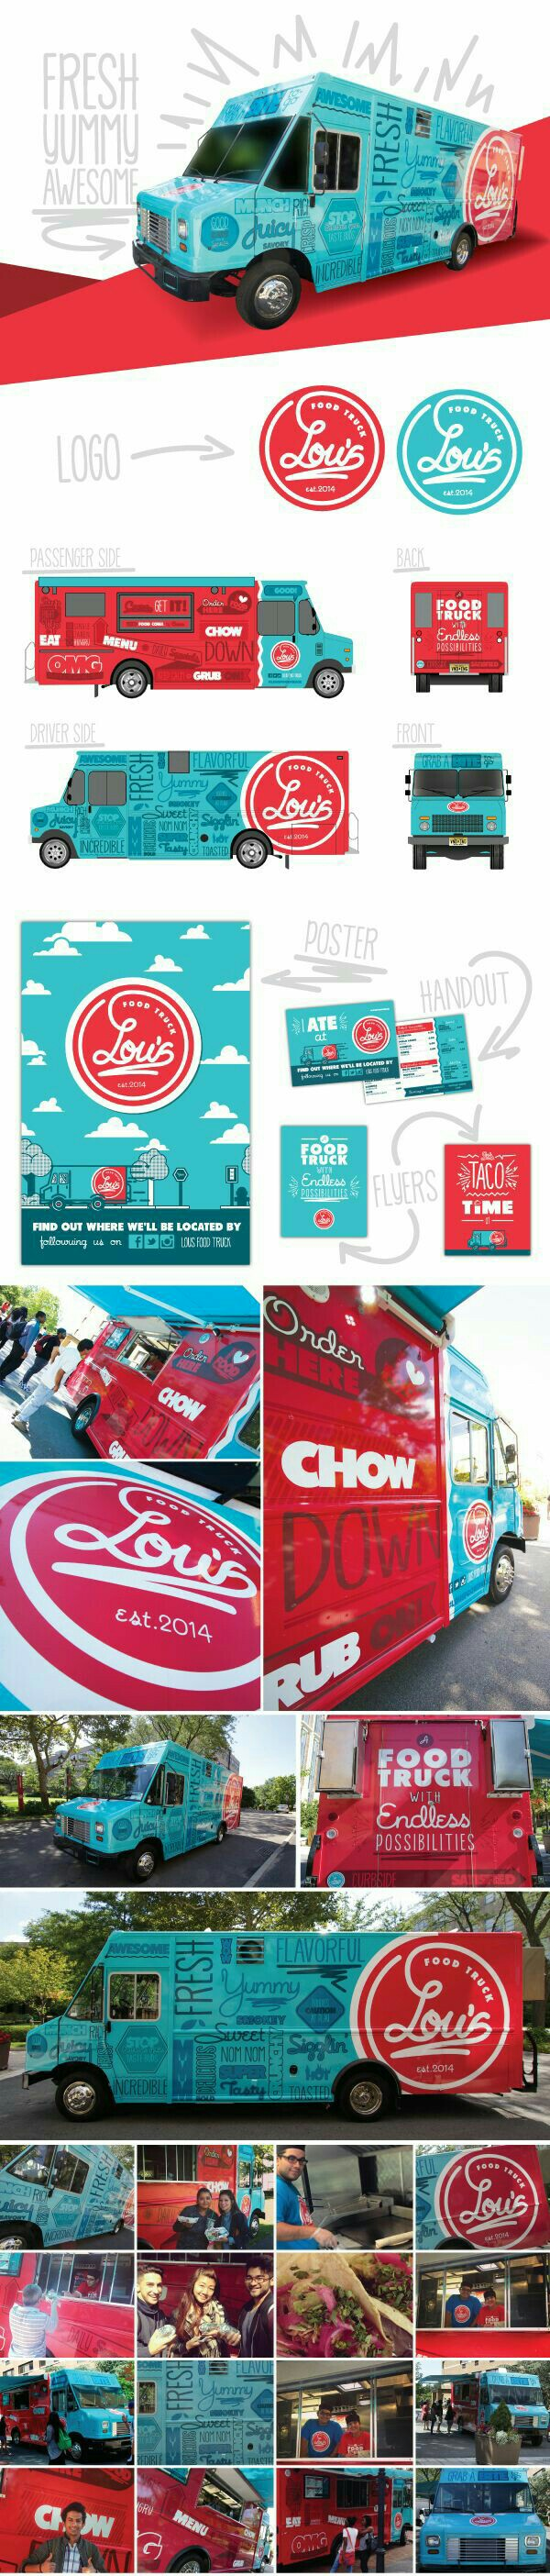 Pin By Kapitan Nemo On Carros Food Truck Design Food Truck Truck Design